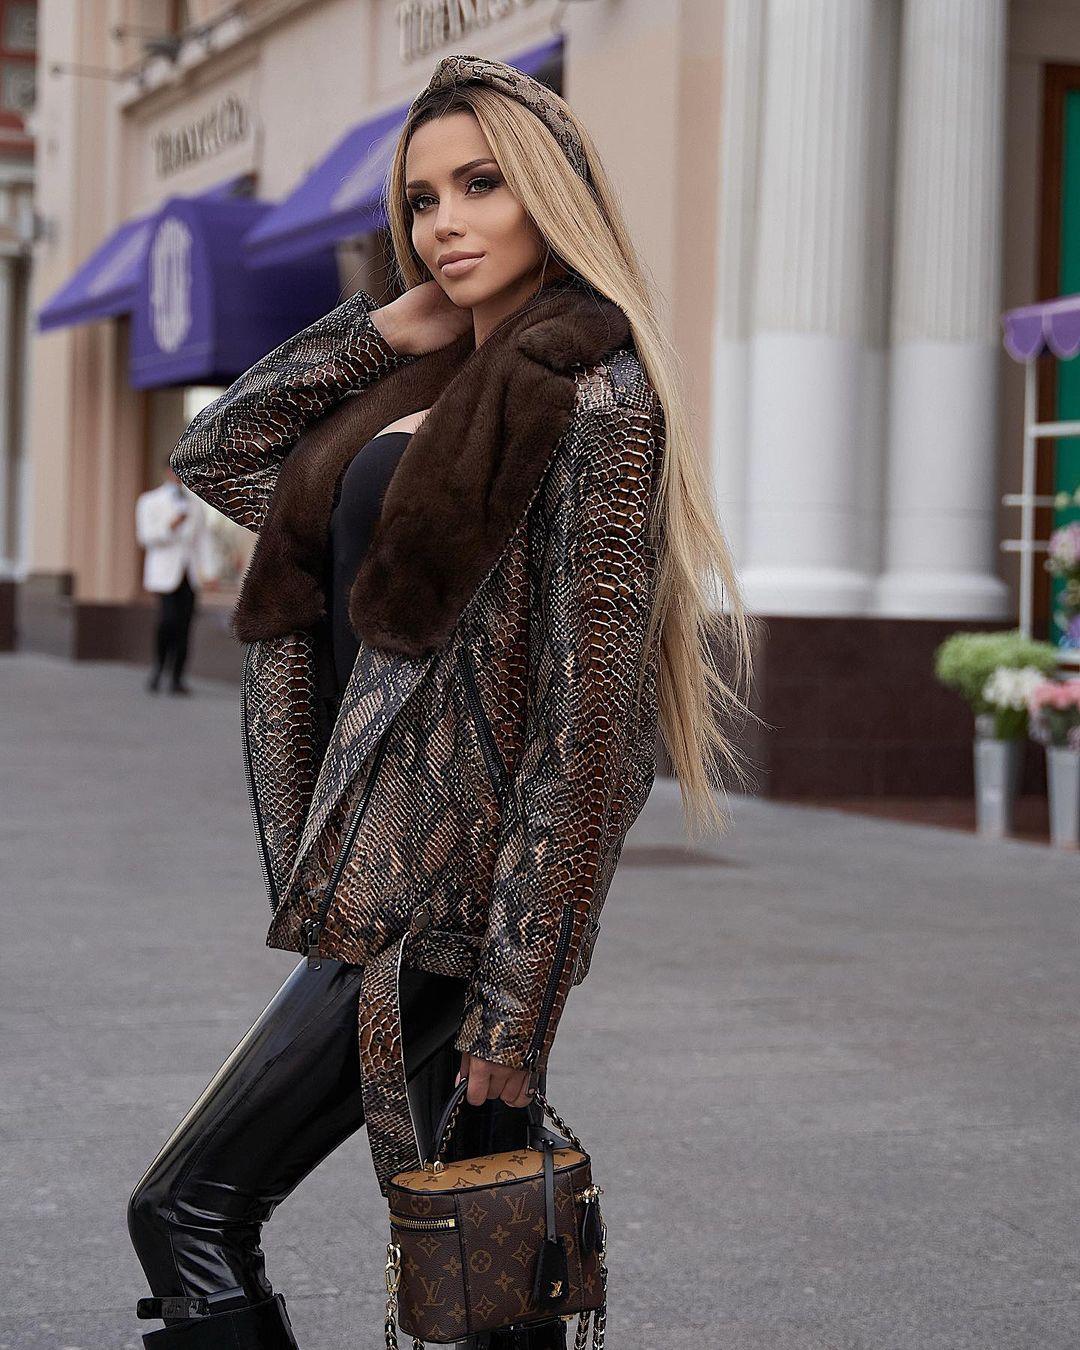 Anastasiya-Timonina-Wallpapers-Insta-Fit-Bio-5